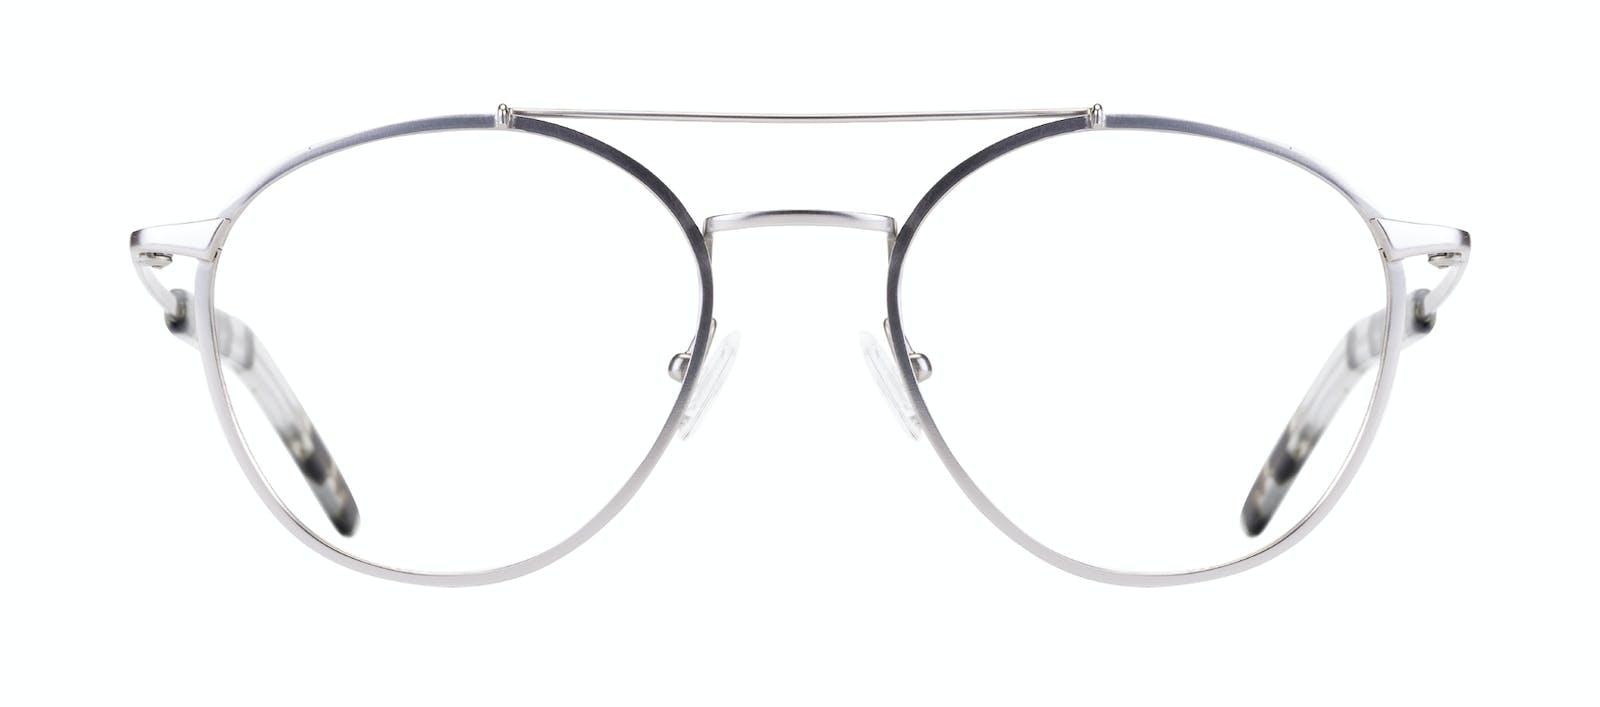 37c384e3da Affordable Fashion Glasses Aviator Eyeglasses Men Gravity Silver Front